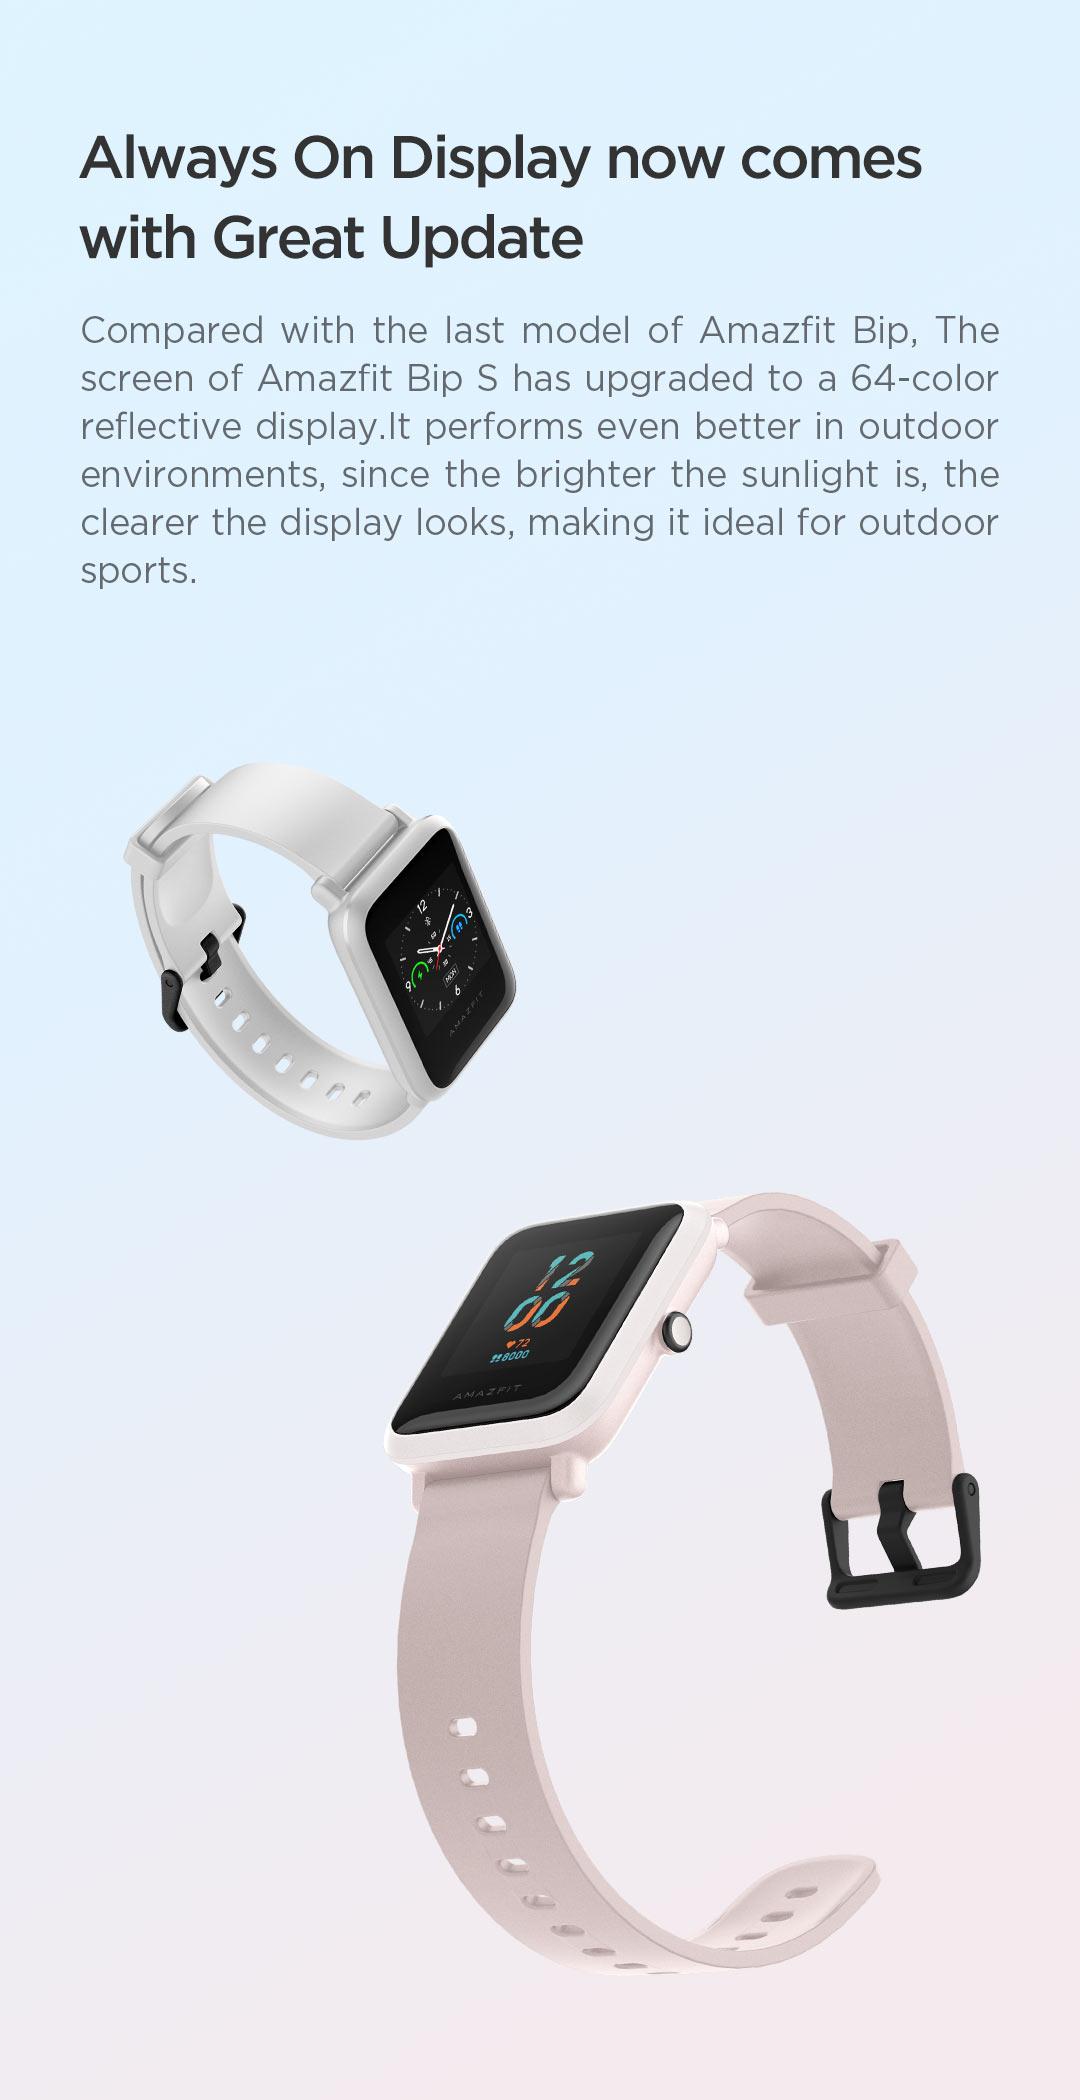 H923e00348c54429ea0e38b151fbd5726M In Stock 2020 Global Amazfit Bip S Smartwatch 5ATM waterproof built in GPS GLONASS Smart Watch for Android iOS Phone